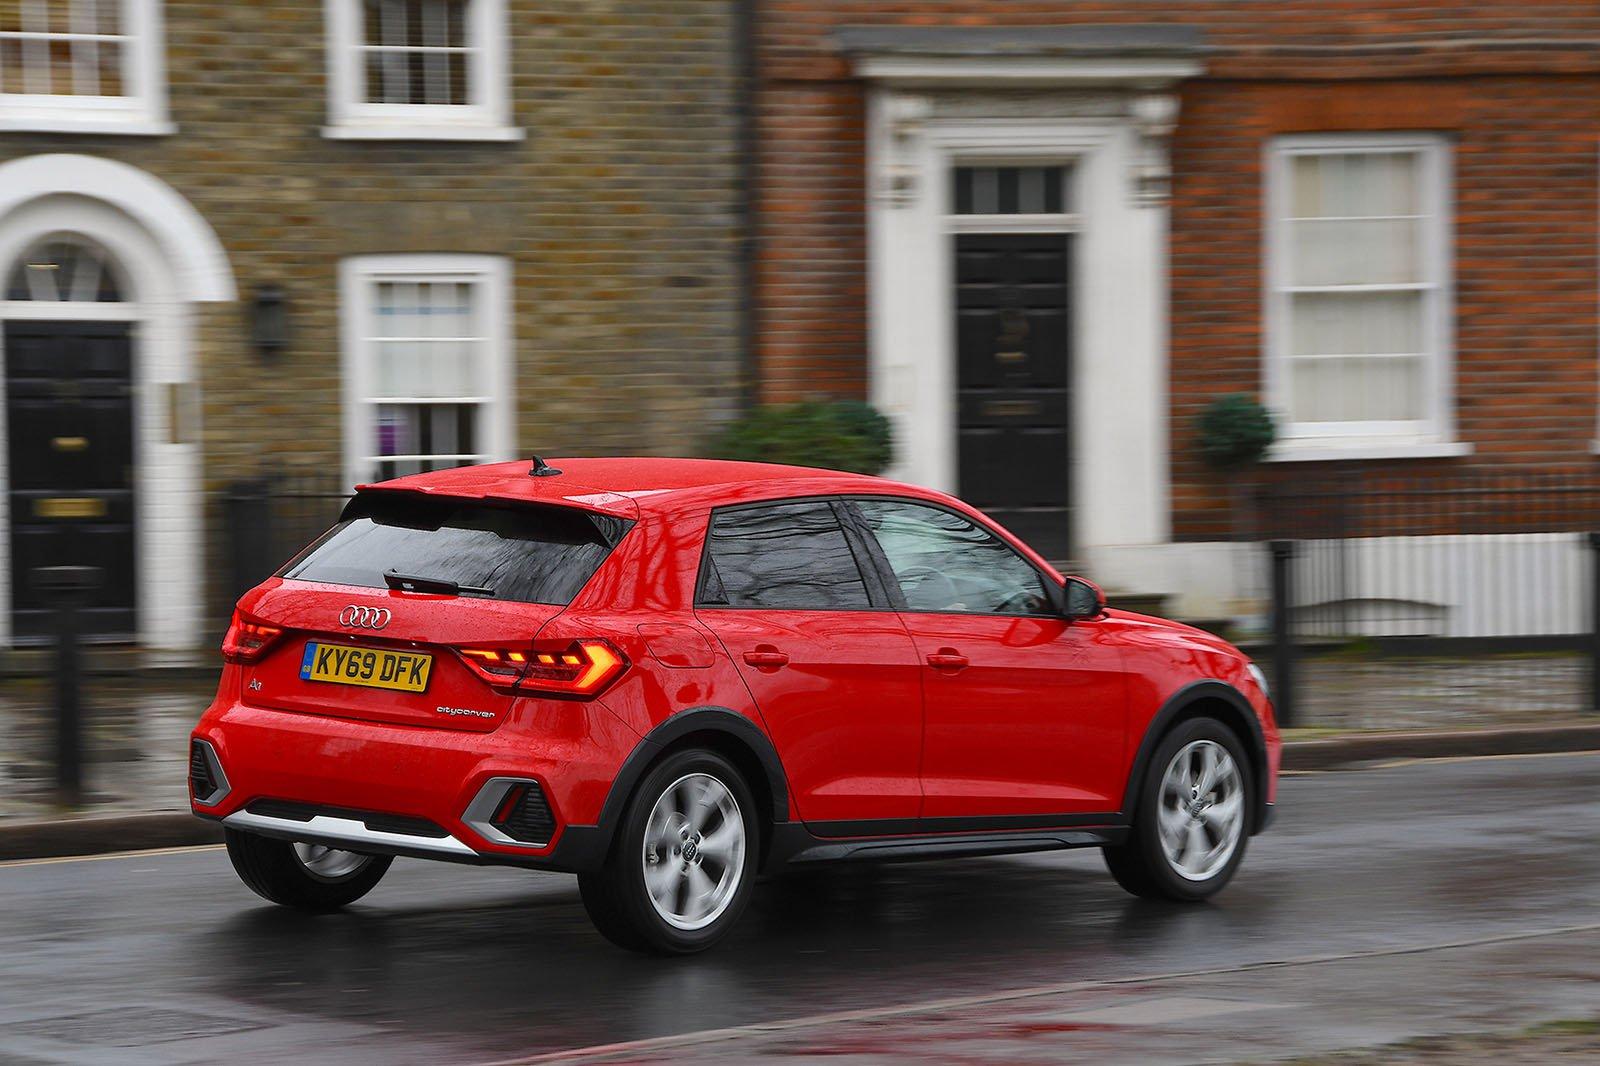 Audi A1 Citycarver verdict